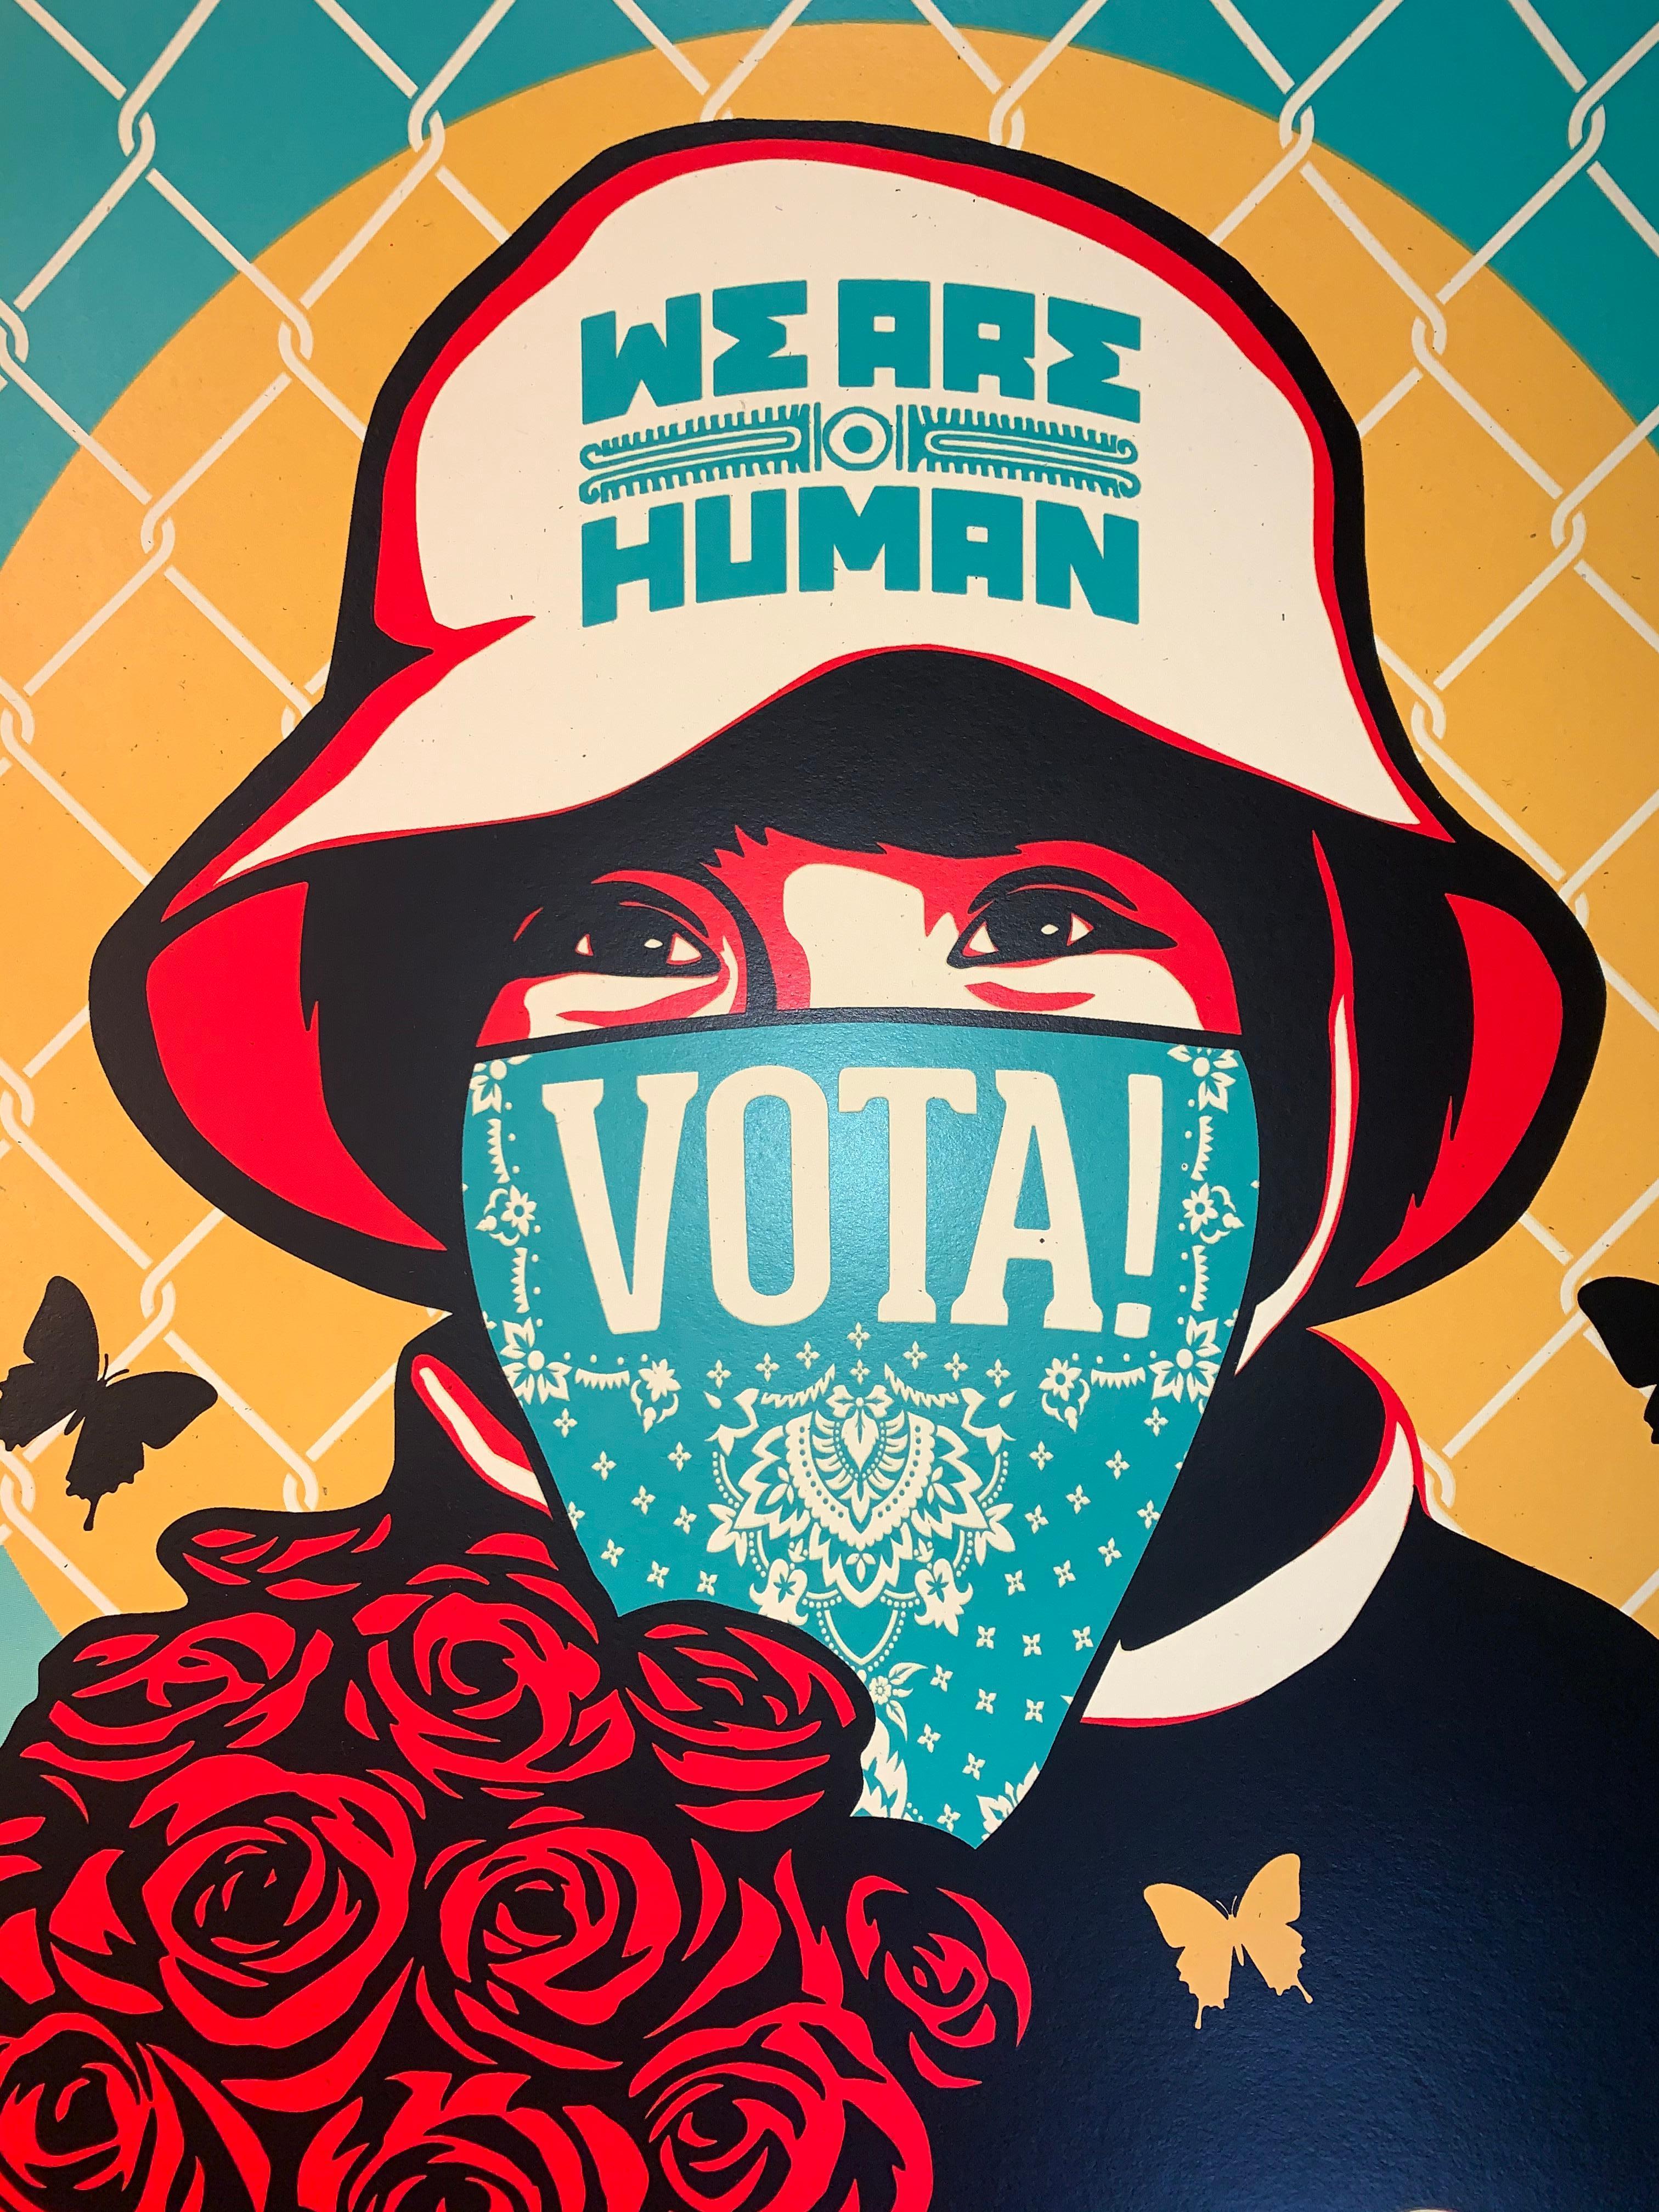 Vote! Stop Fascism 20 Shepard Fairey / Ernesto Yerena Fine Art Urban Art Street